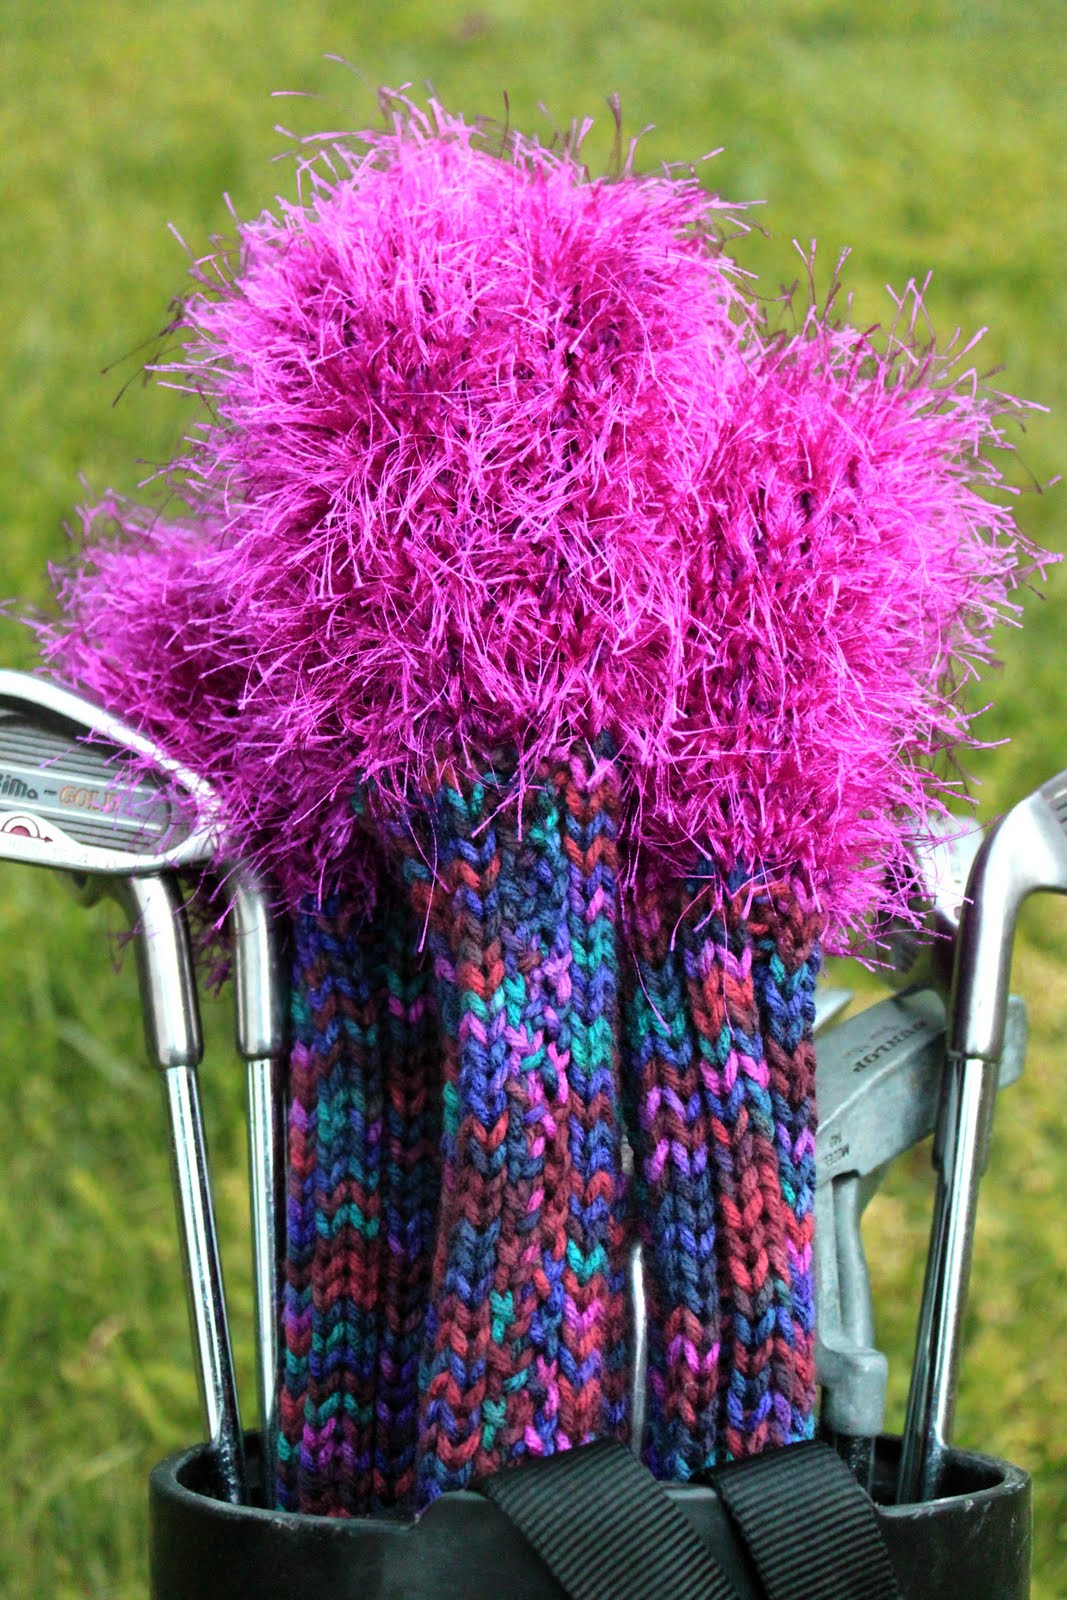 Knit Golf Head Covers Pattern A Knitting Blog